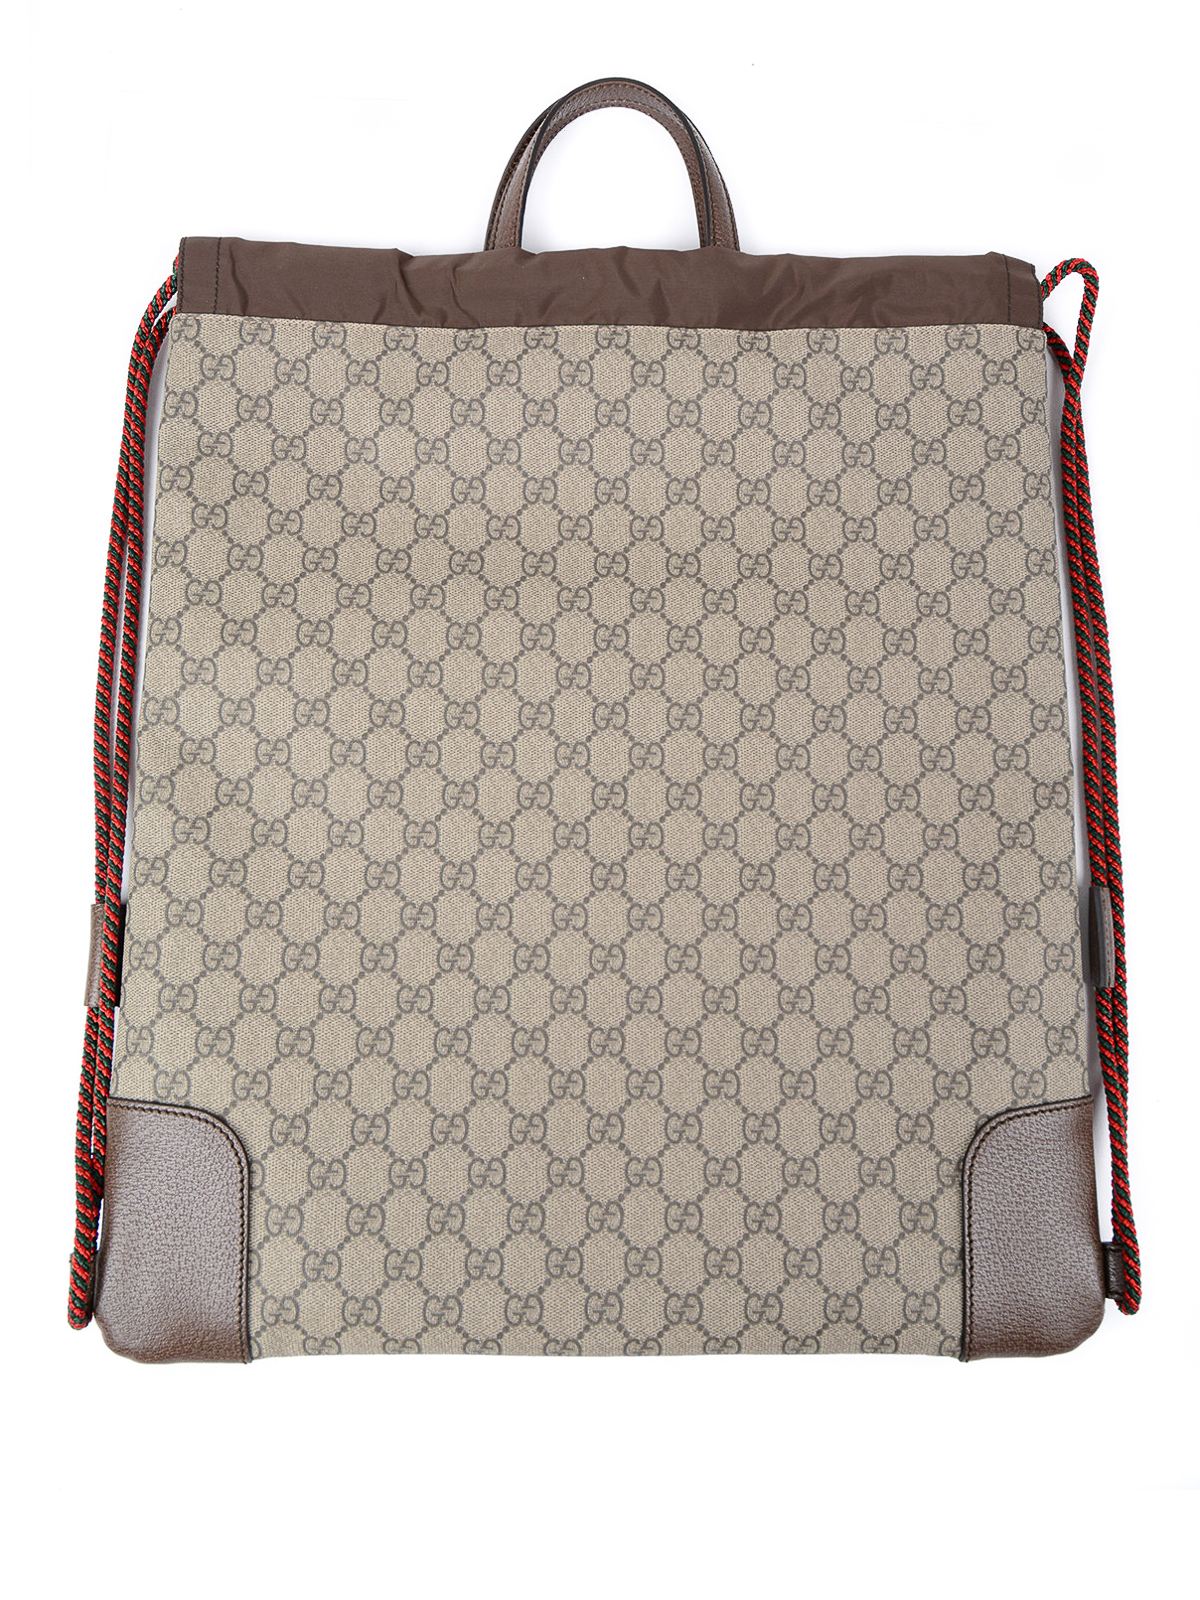 Gucci - GG backpack with applications - backpacks - 473872K9RVT8863 ddaa546792